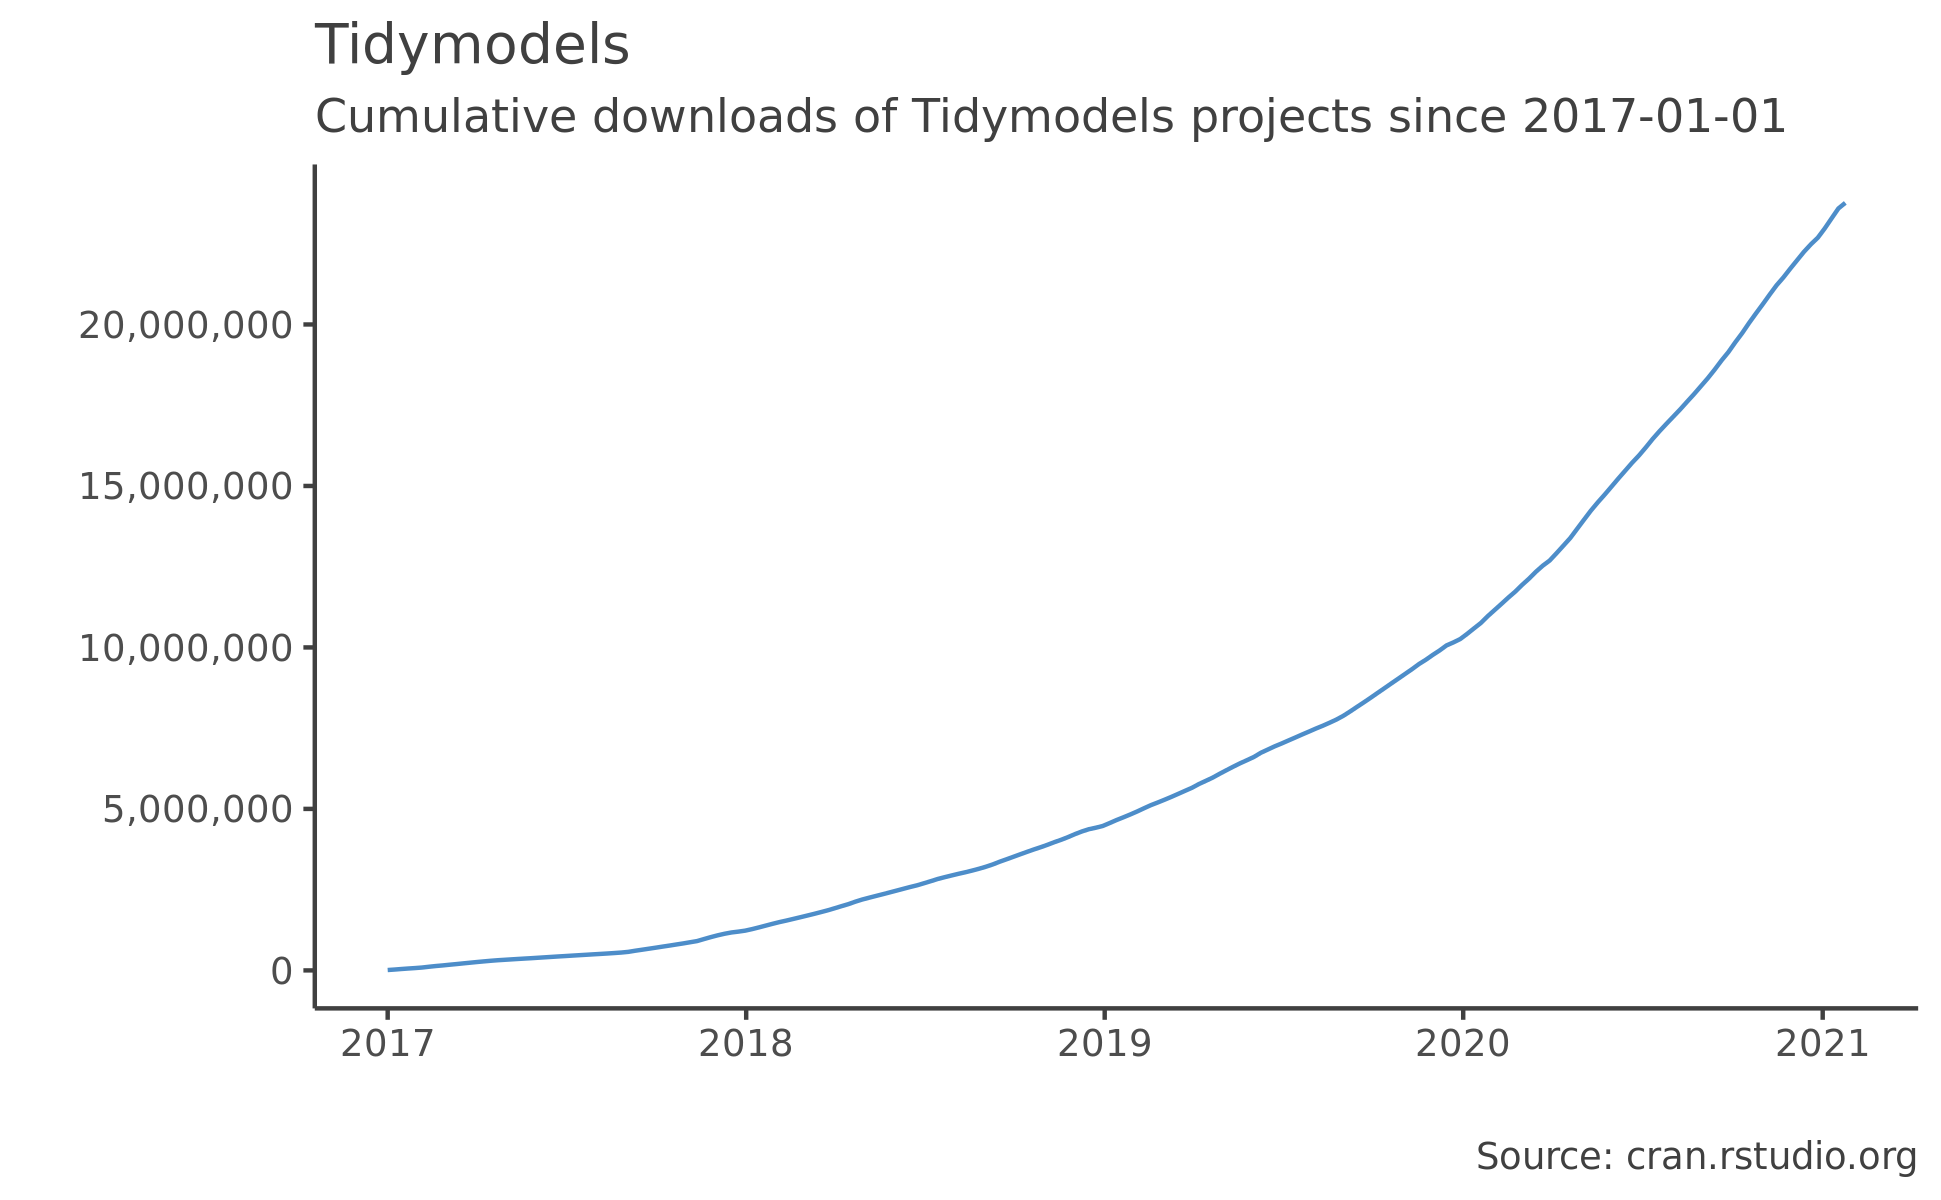 Tidymodels graph